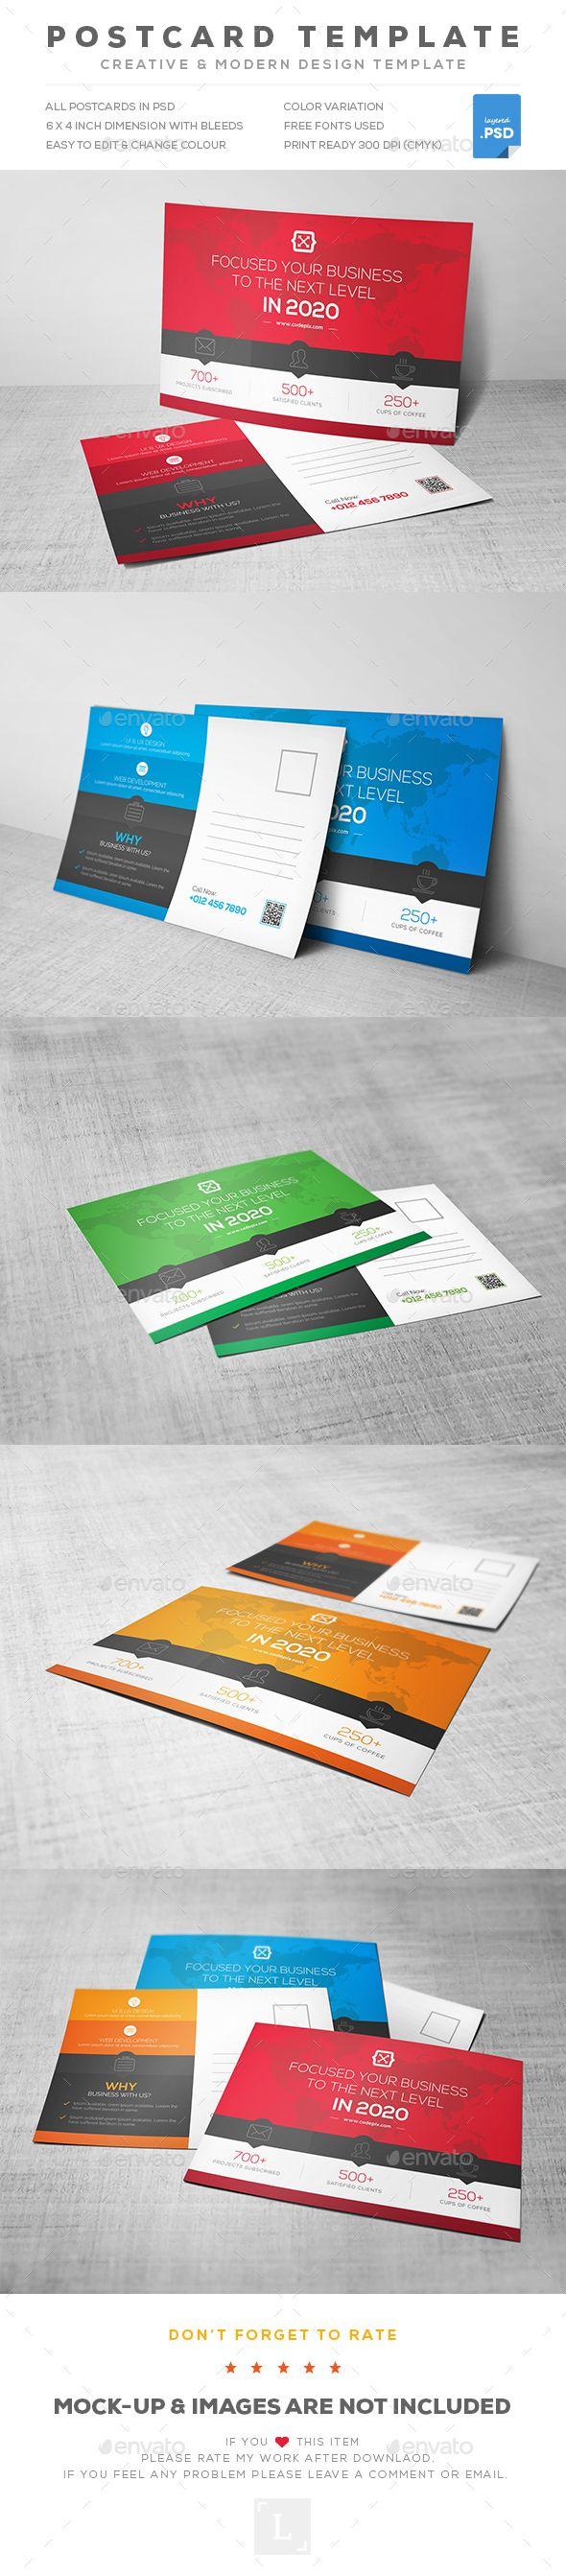 best ideas about postcard template post card corporate postcard template psd